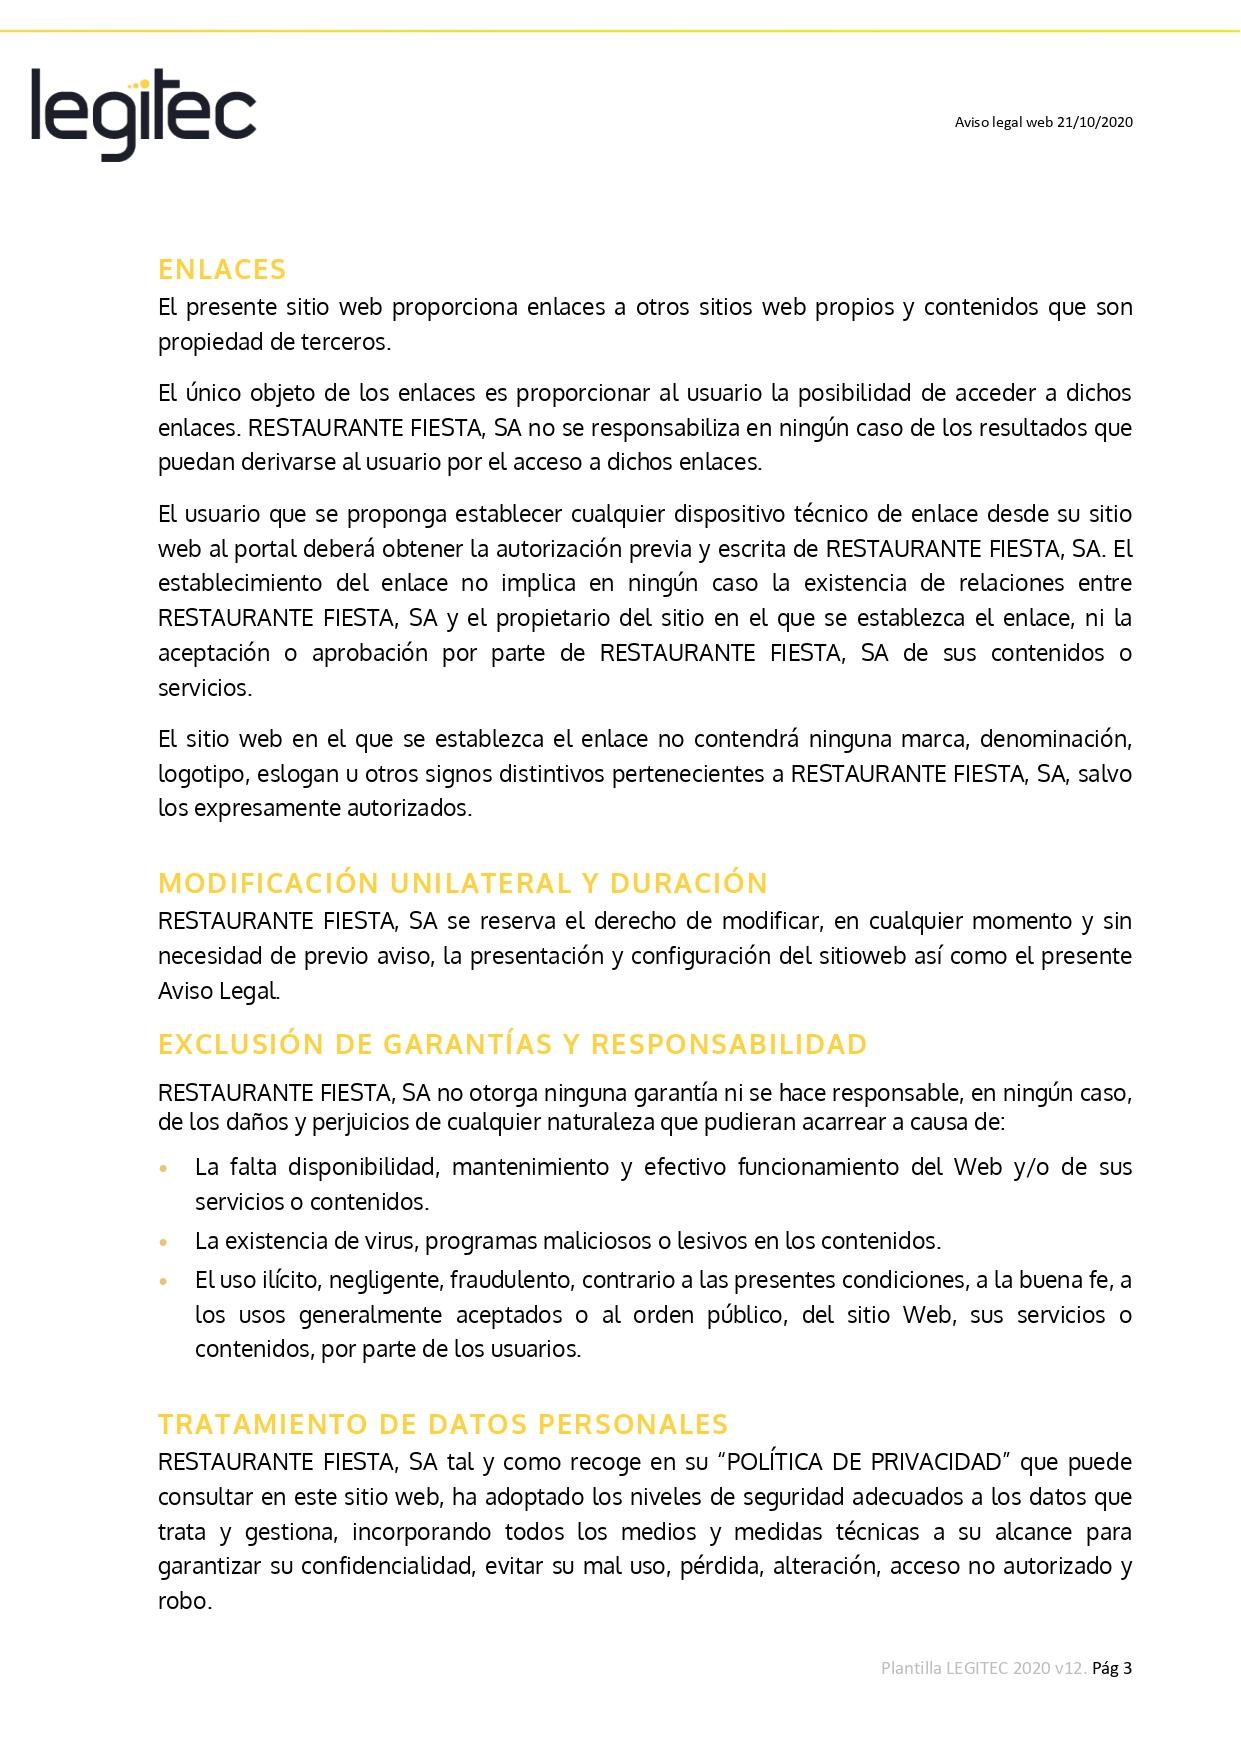 WEB-AVISO-LEGAL_page-0003